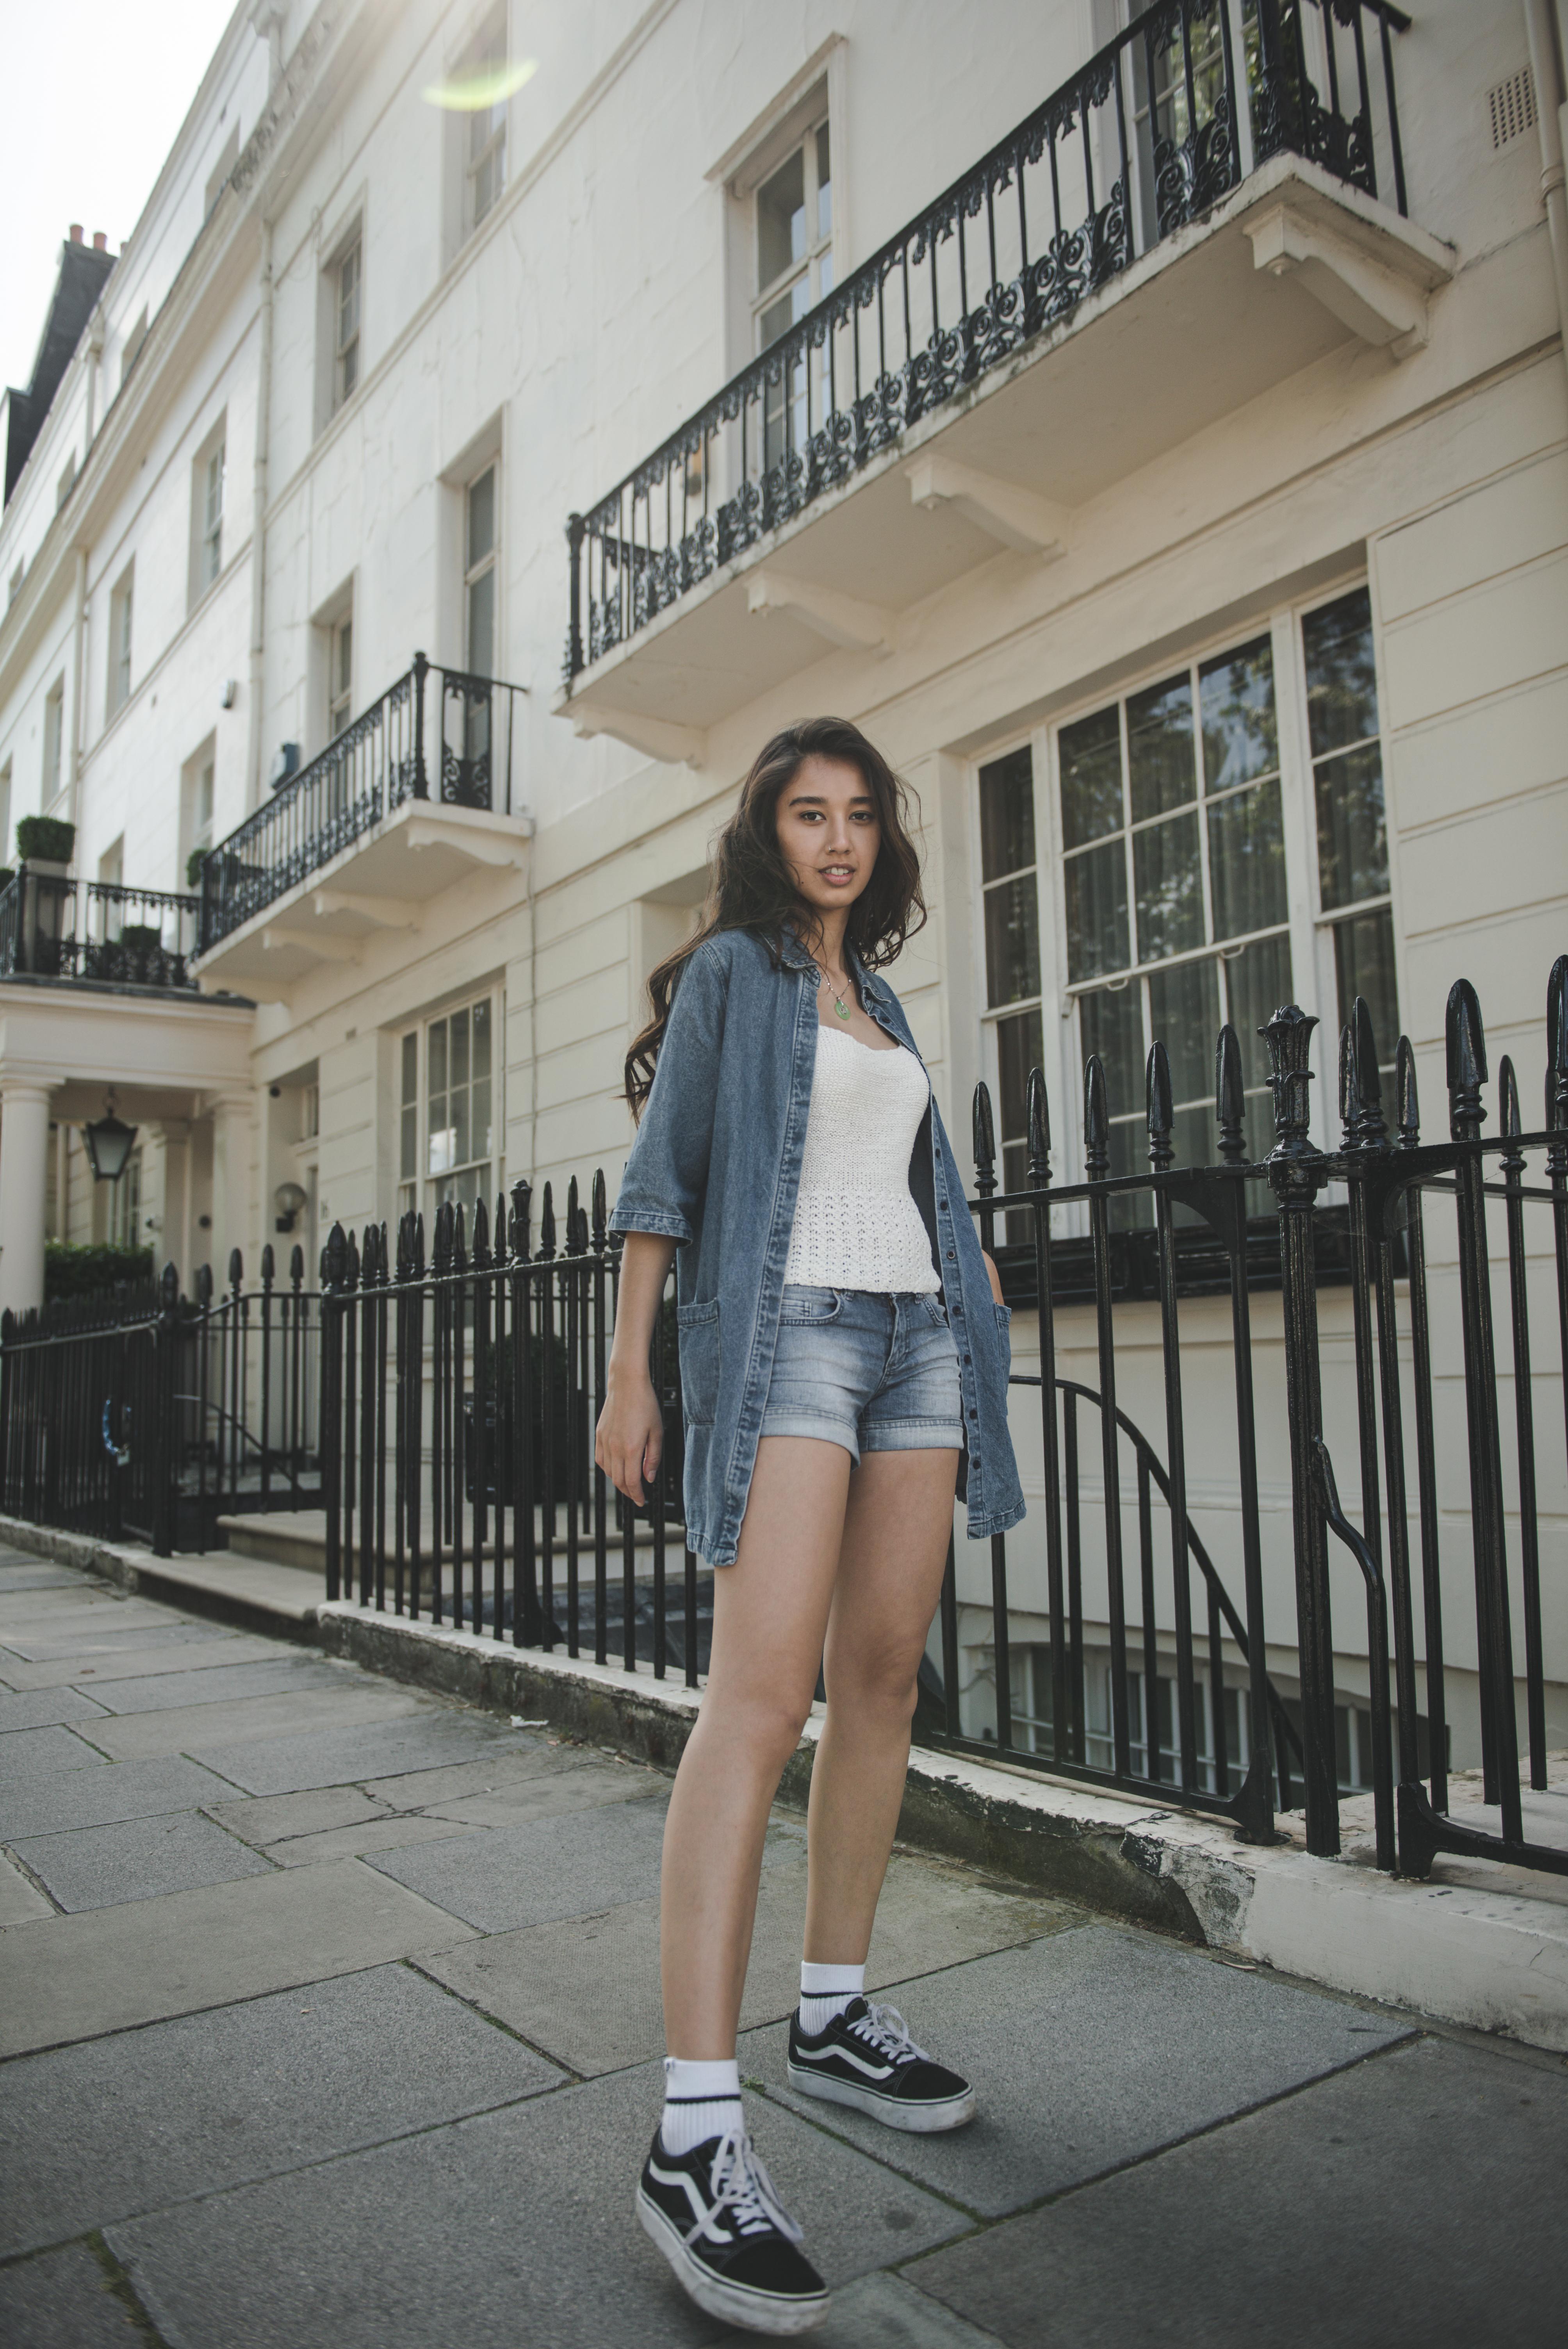 Shine-Female-Model-Annie-Asian-London-08.JPG#asset:52843